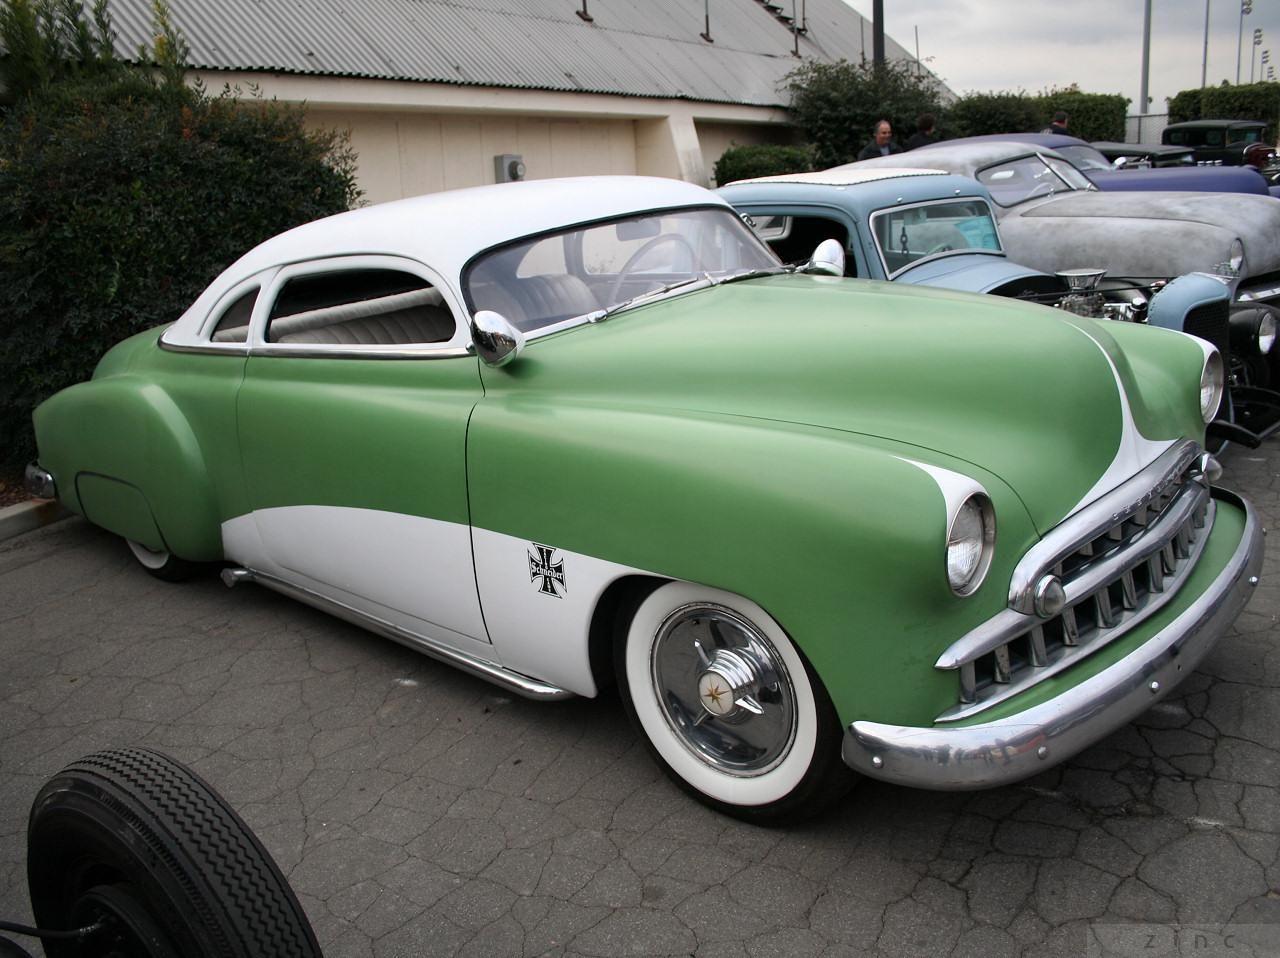 1950 chevrolet bel air custom classic cars pinterest chevy chevrolet bel air and bel air